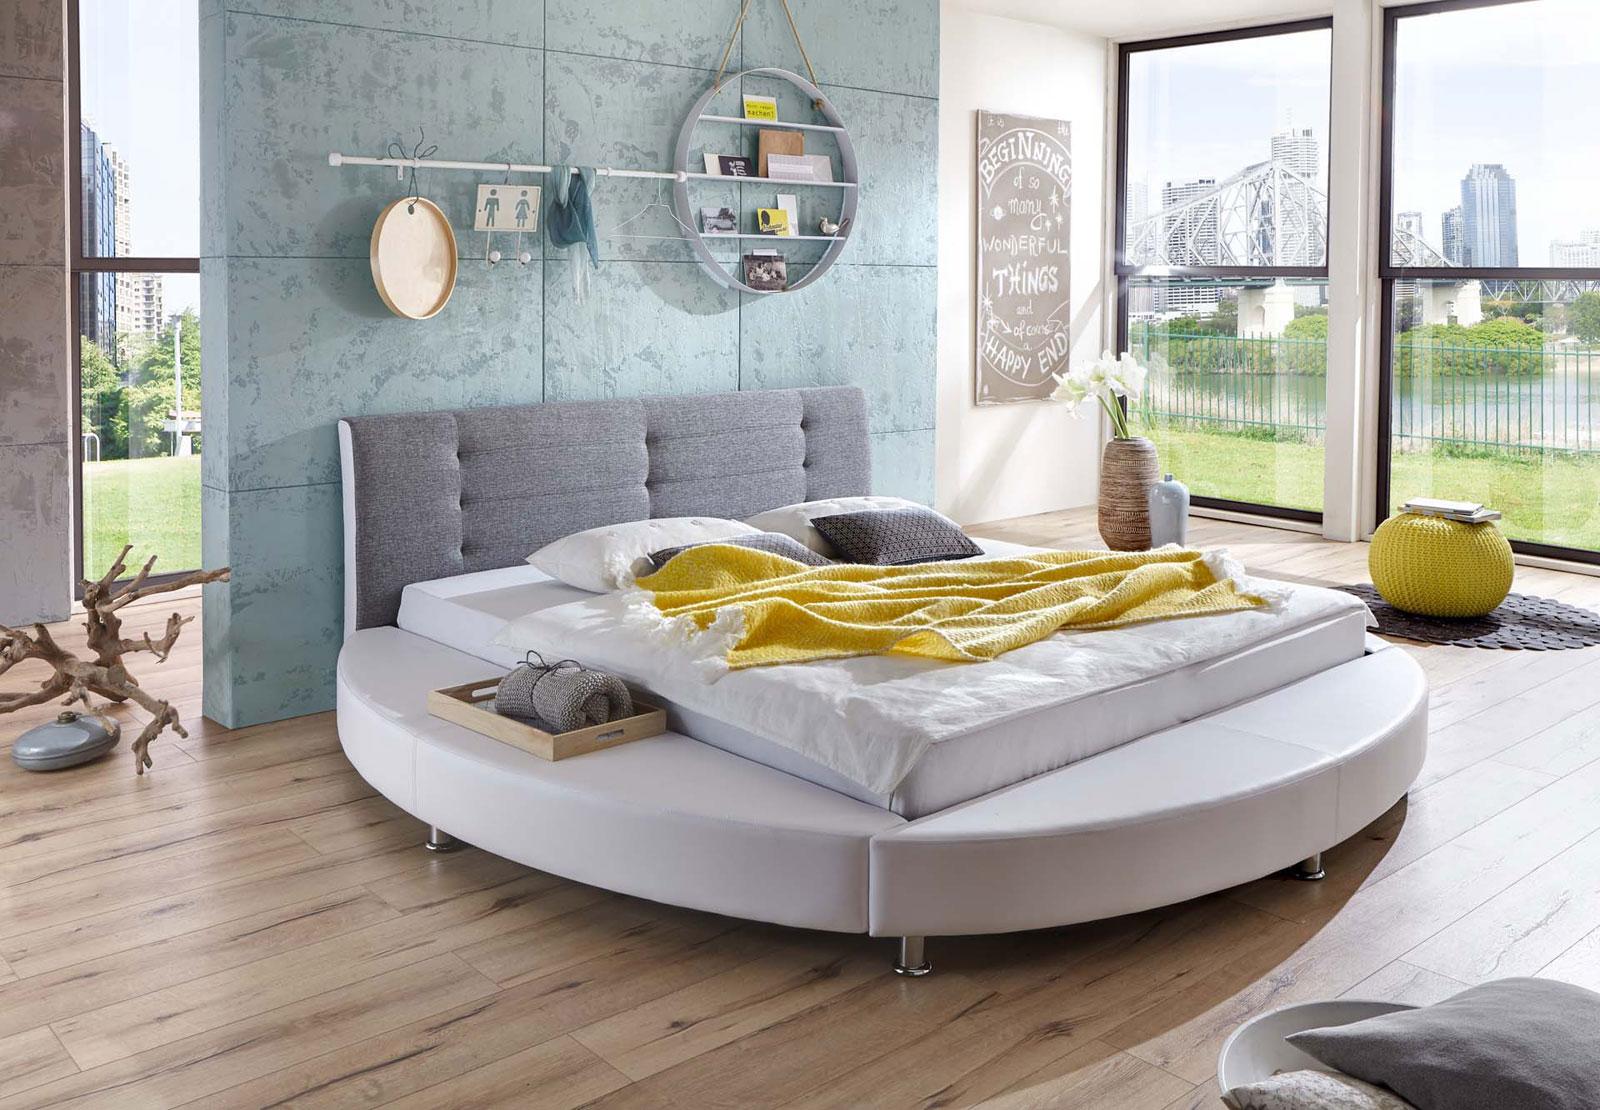 sale rundbett doppelbett wei stoff grau ehebett 180 xm. Black Bedroom Furniture Sets. Home Design Ideas